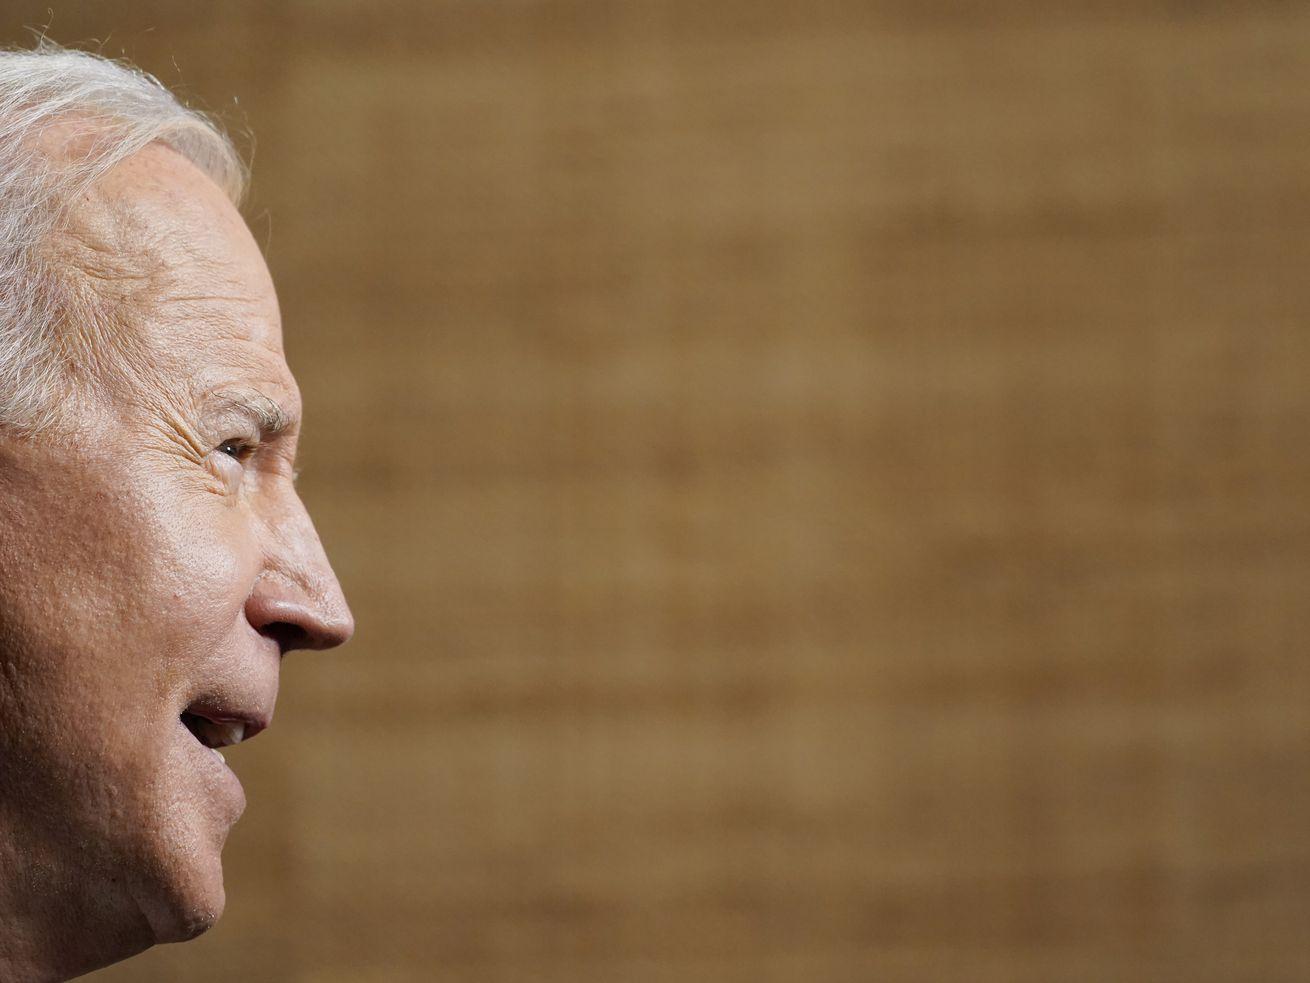 President Joe Biden, in profile while speaking.